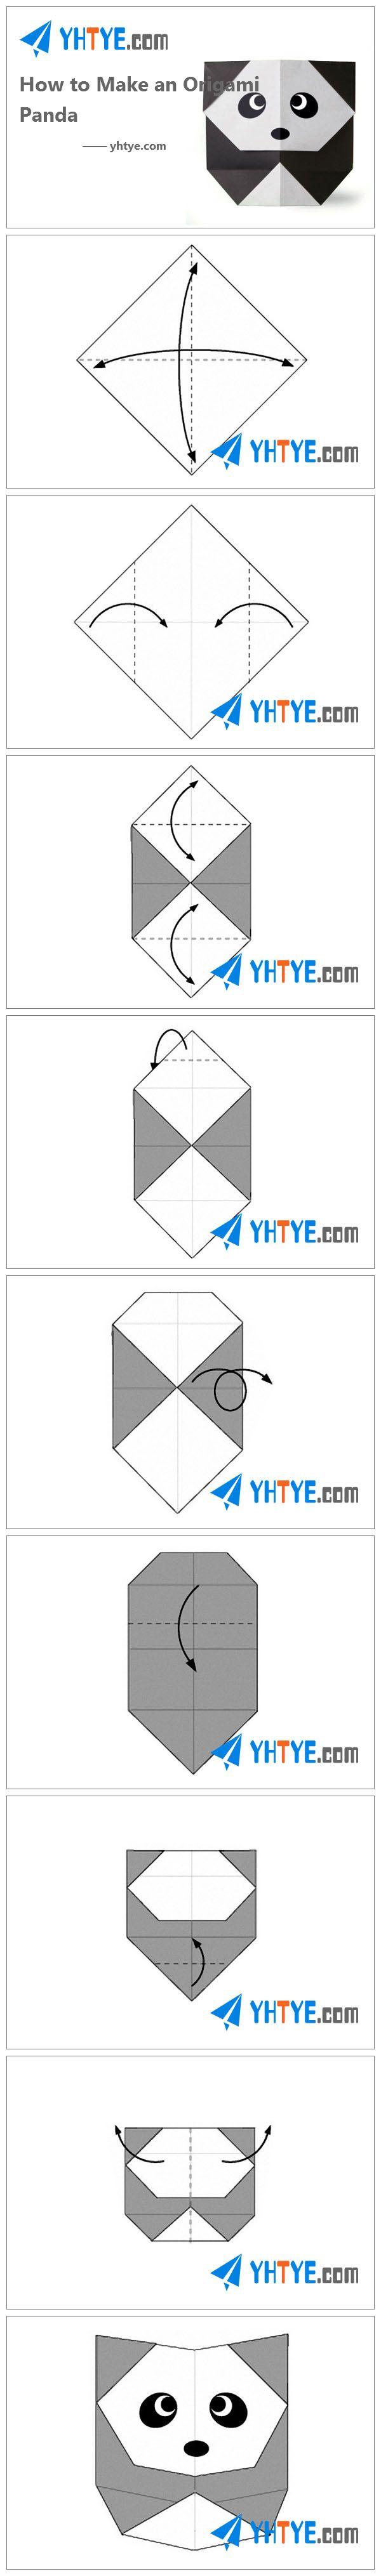 DIY & Crafts from YHTYE.COM Many origami animal patterns